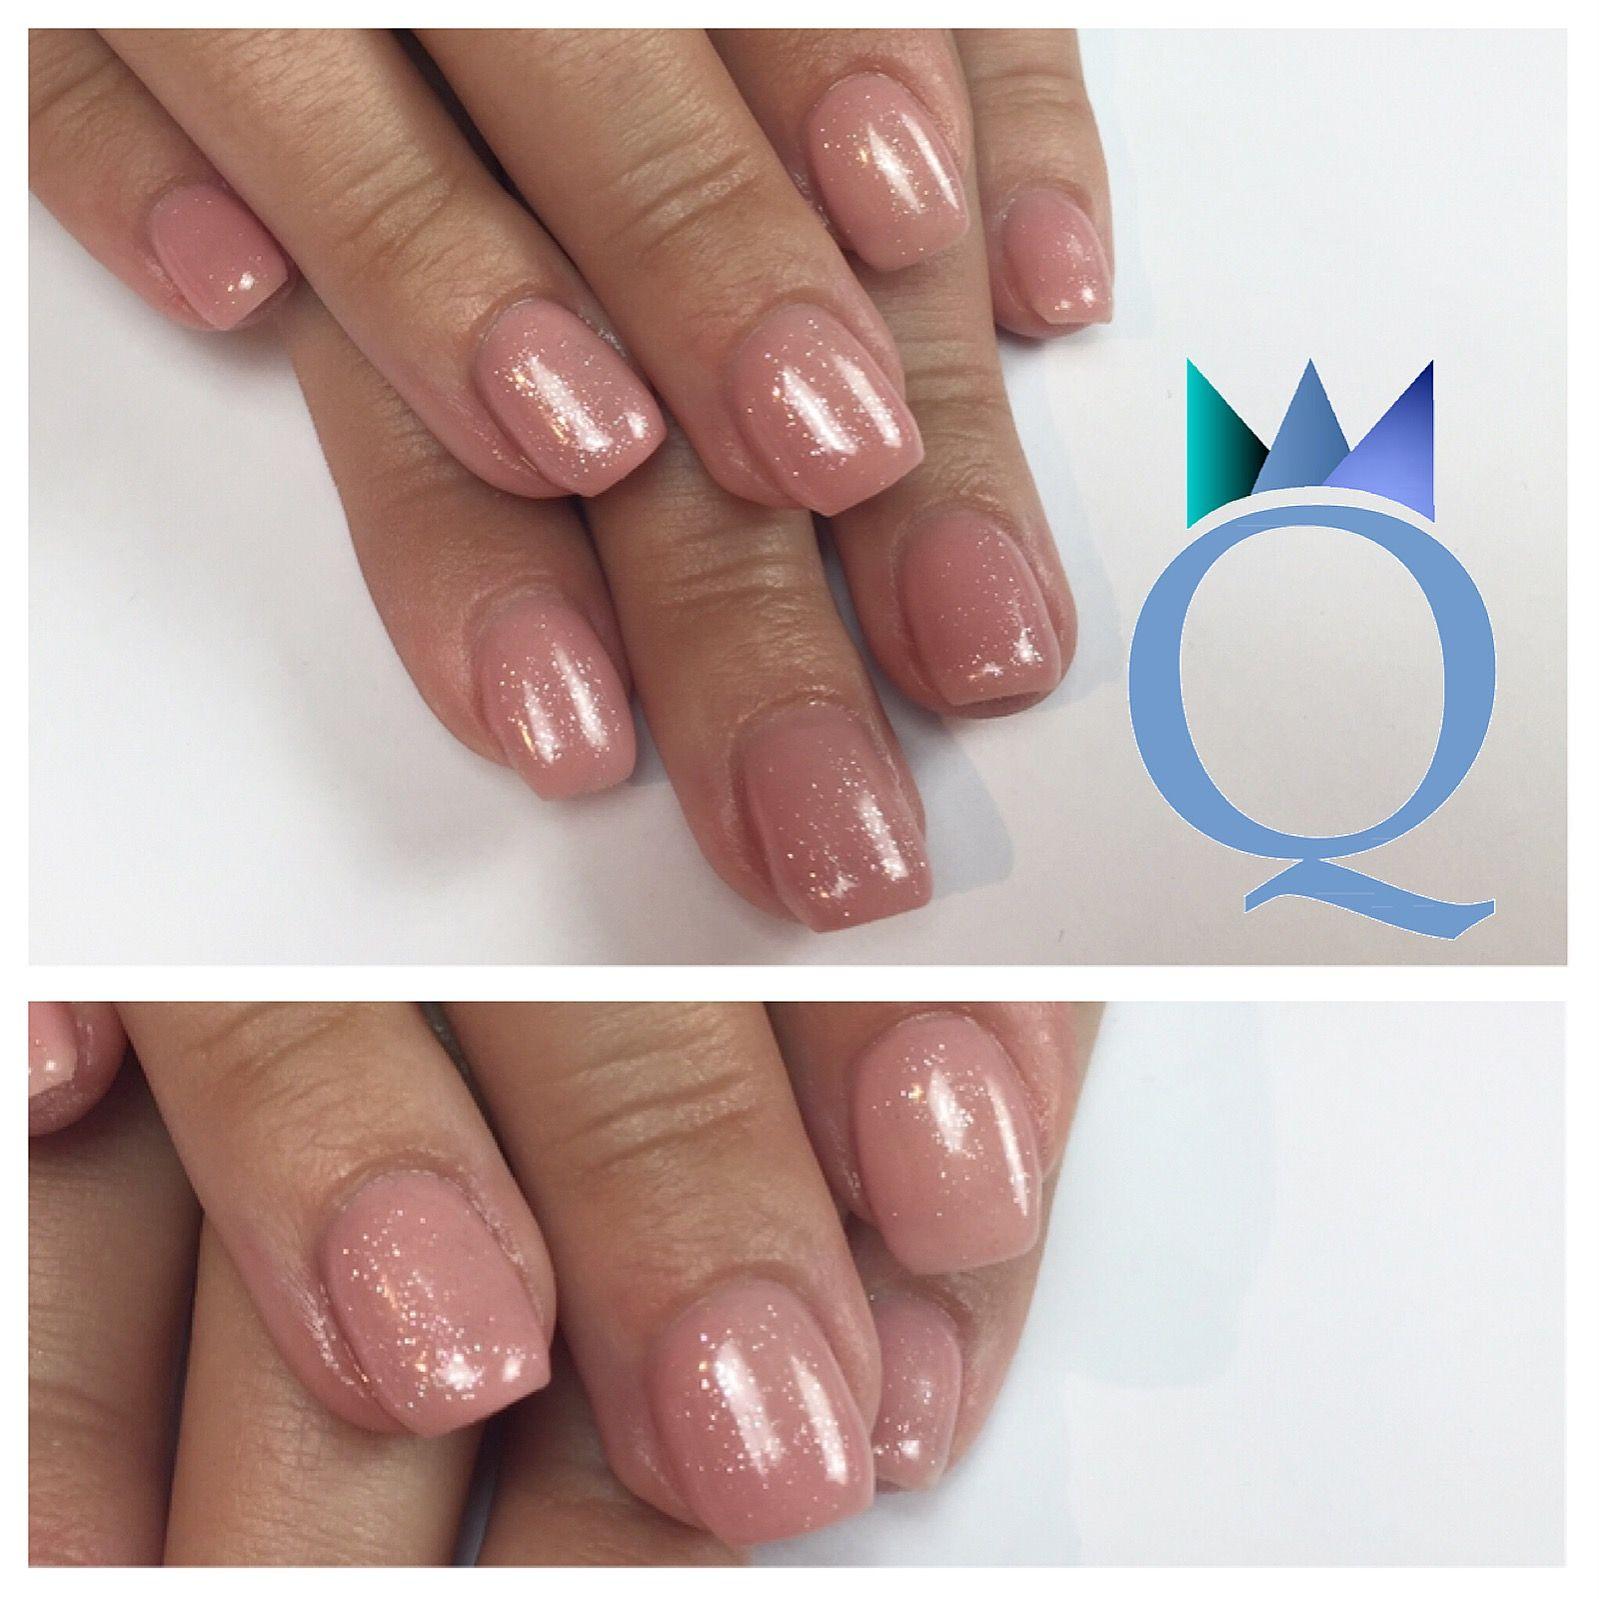 shortnails #gelnails #nails #natural #kurzenägel #gelnägel #nägel ...